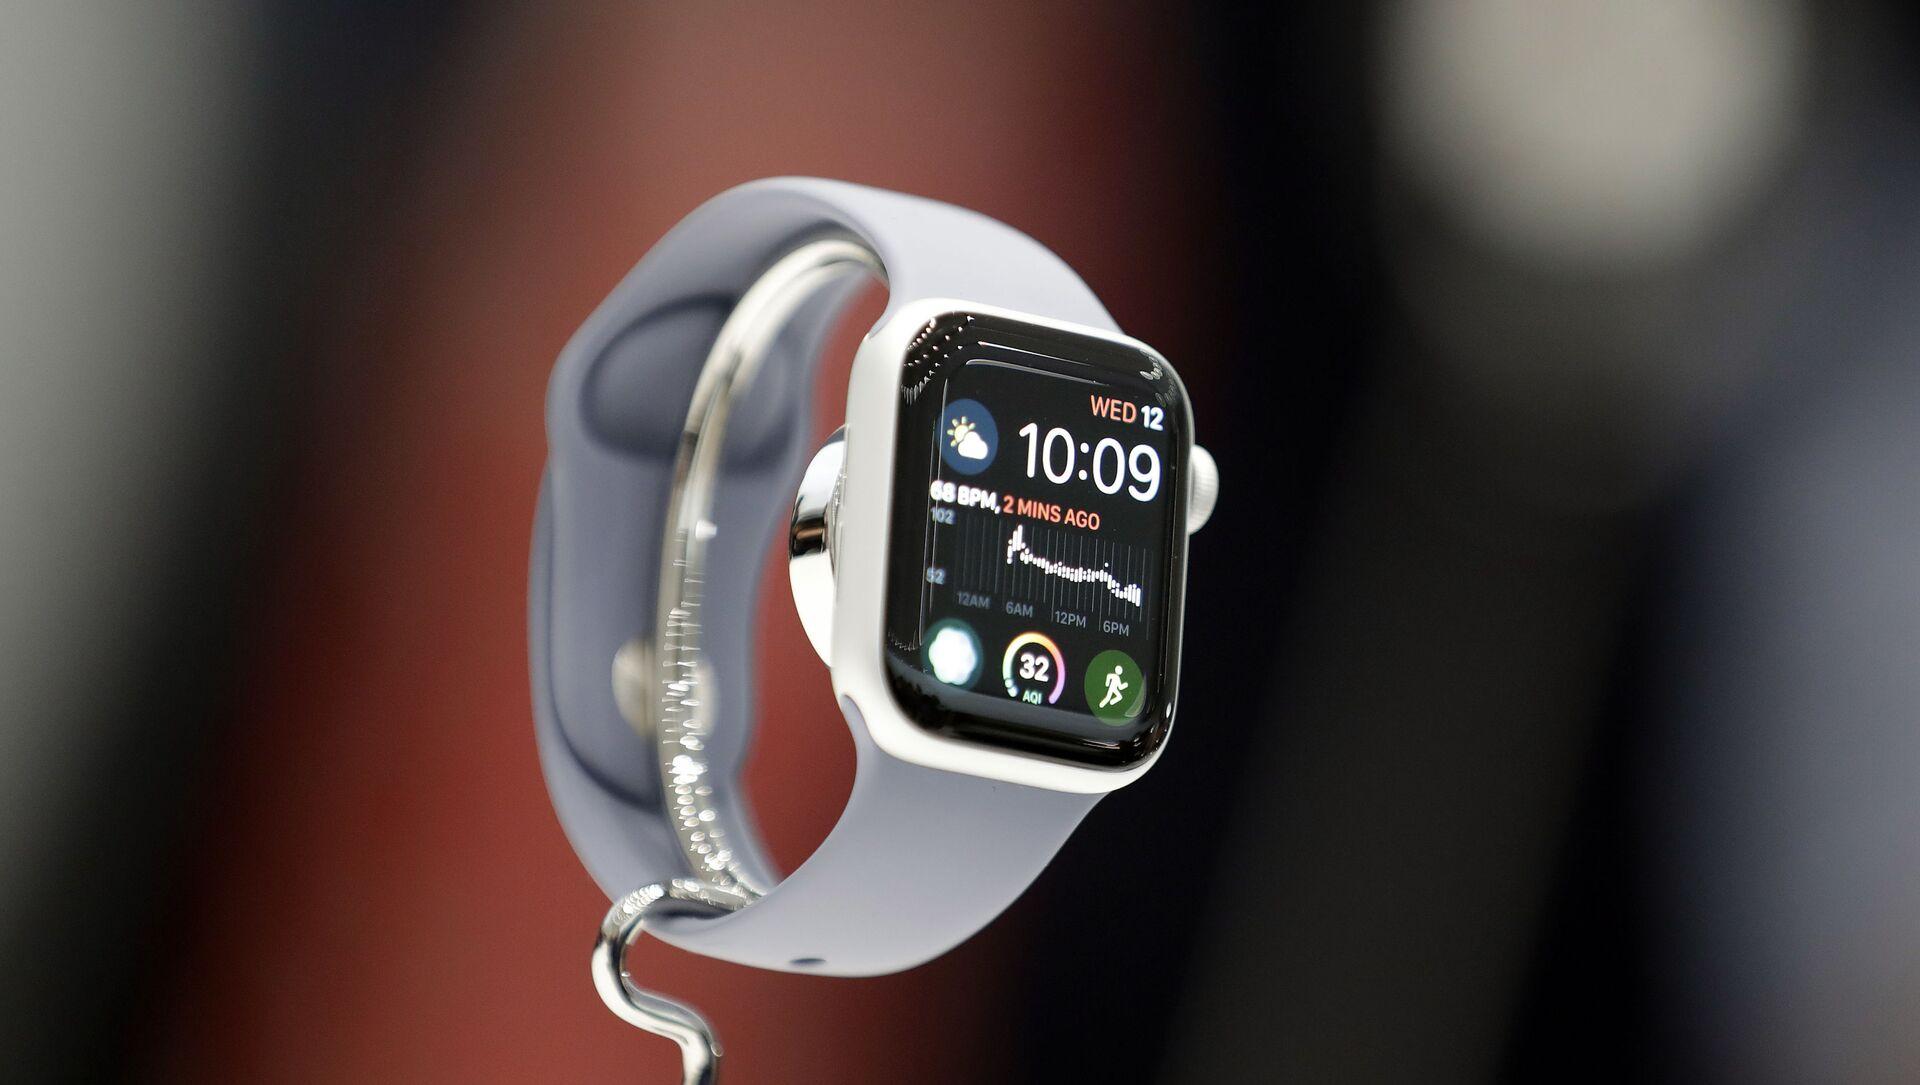 Apple社がスポーツ選手や過酷な条件を想定した「スマート」ウォッチのリリースを予定=ブルームバーグ - Sputnik 日本, 1920, 27.03.2021